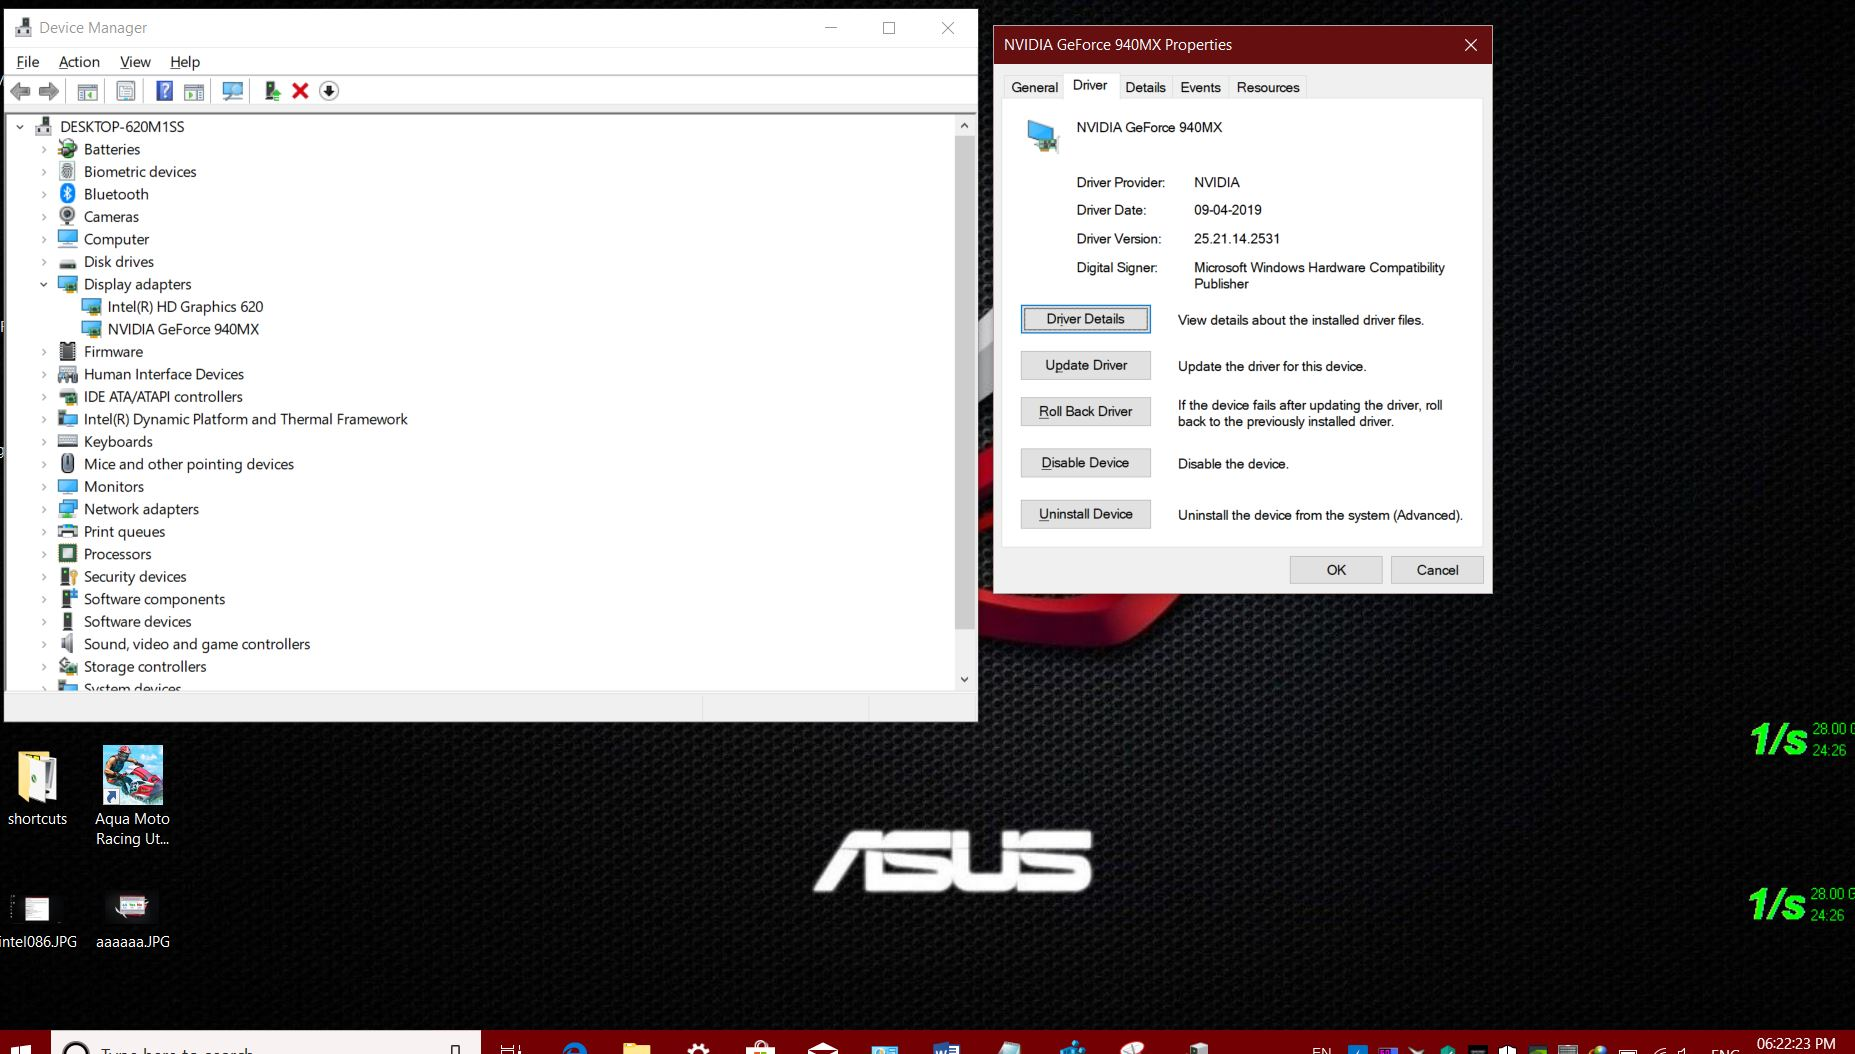 Nvidia Inc Released new Geforce DCH & STANDARD WHQL Driver v445.87 for Notebooks GPU'S &... b974e1e6-c9ee-44aa-a001-3e447b867de1?upload=true.jpg